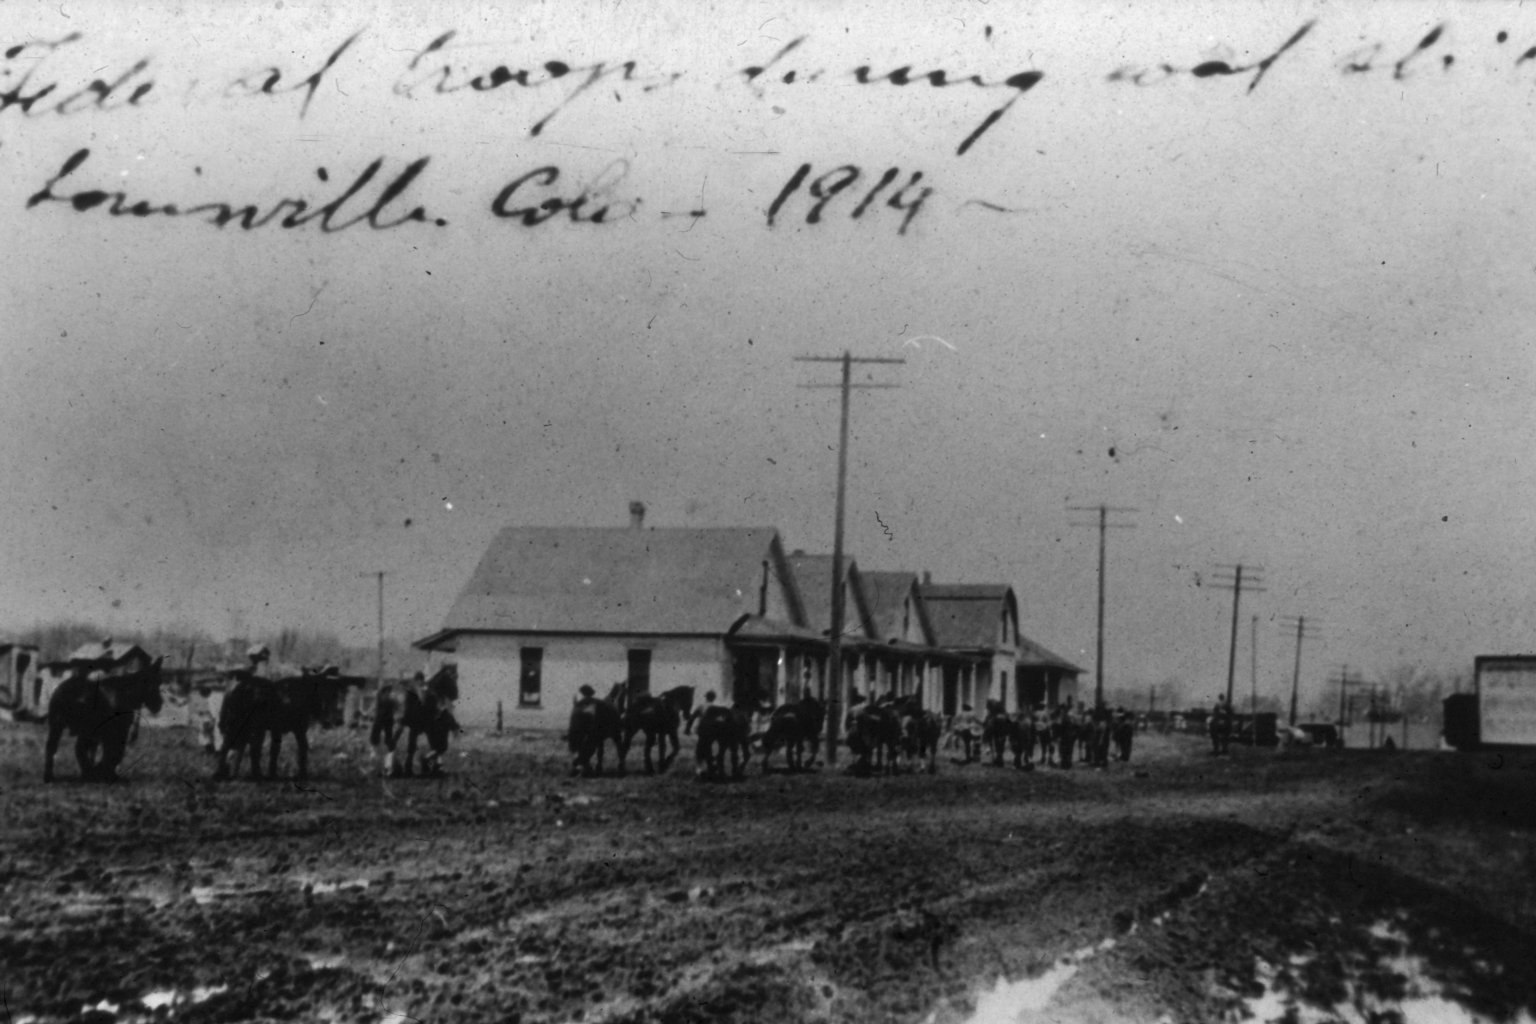 Louisville Ca 1914